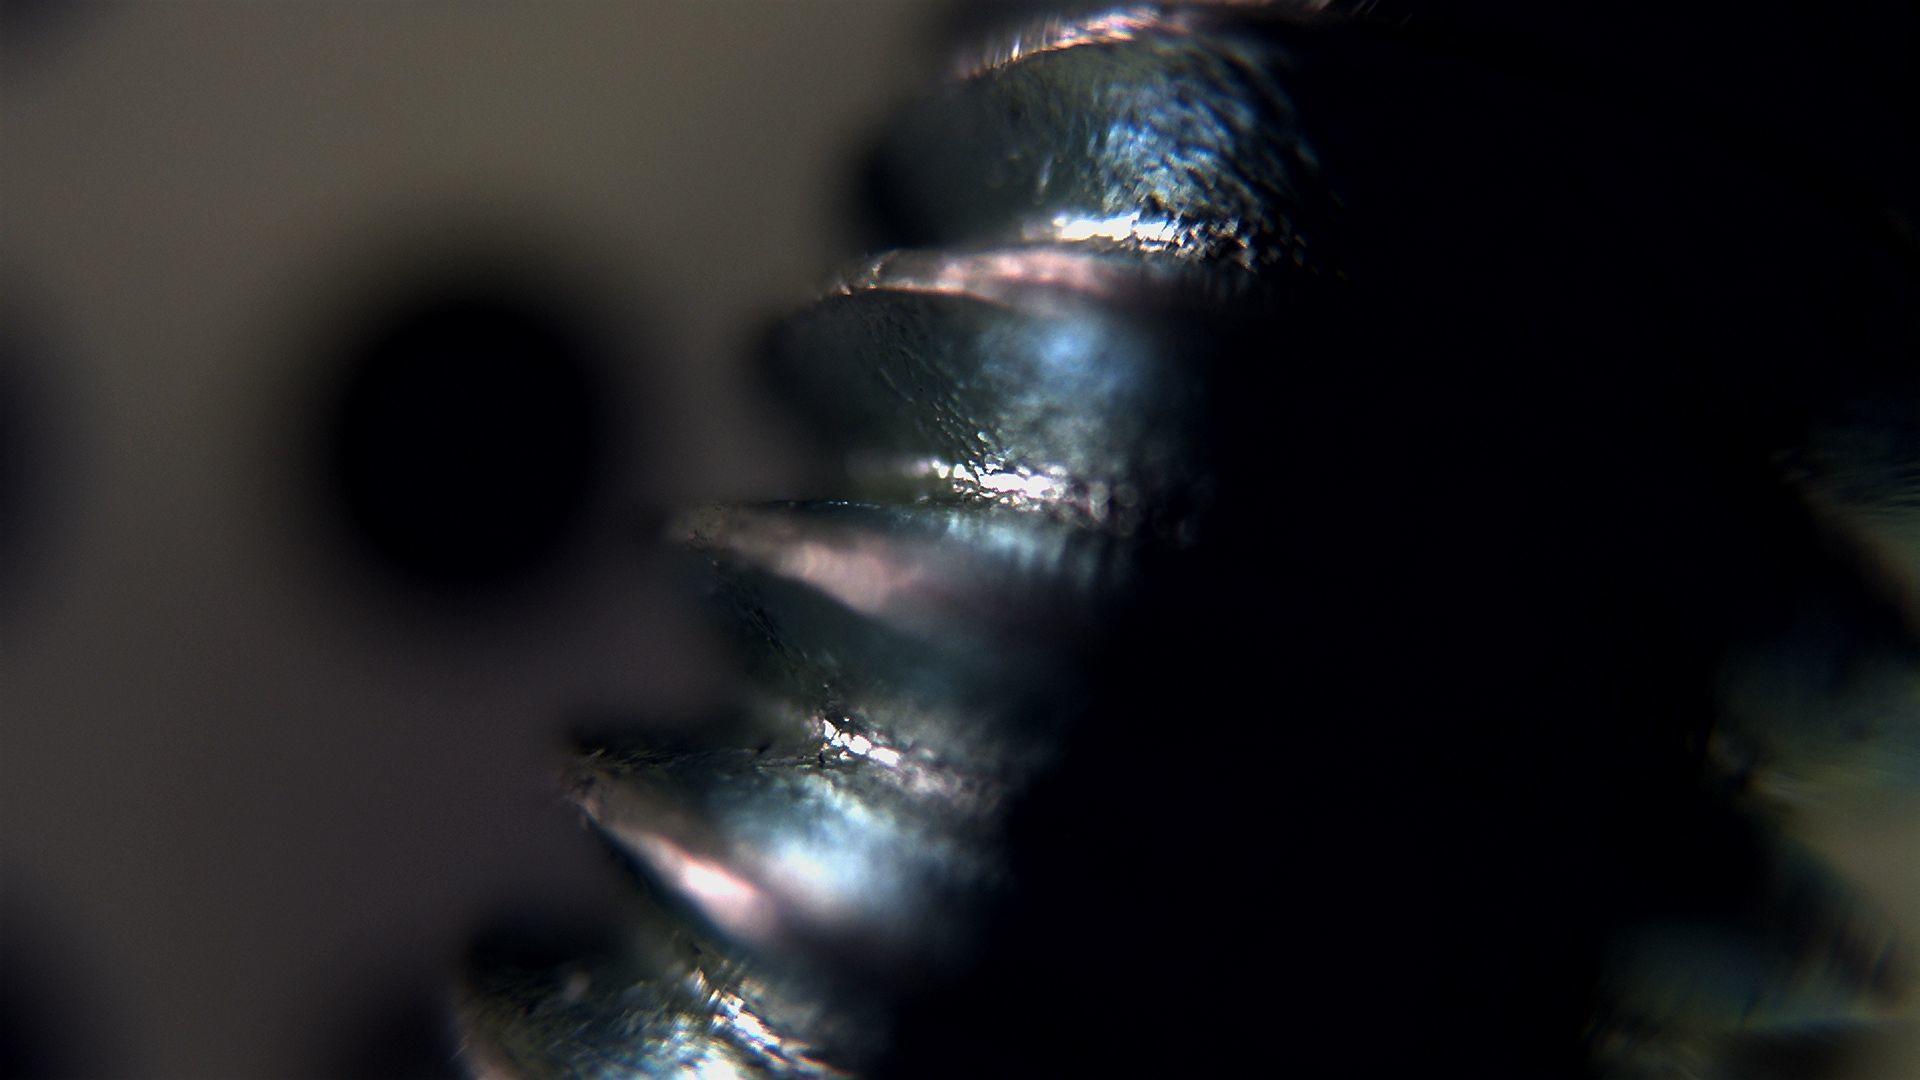 dfk-afux236-m12-svl-ir02820b5m-1mm.jpg